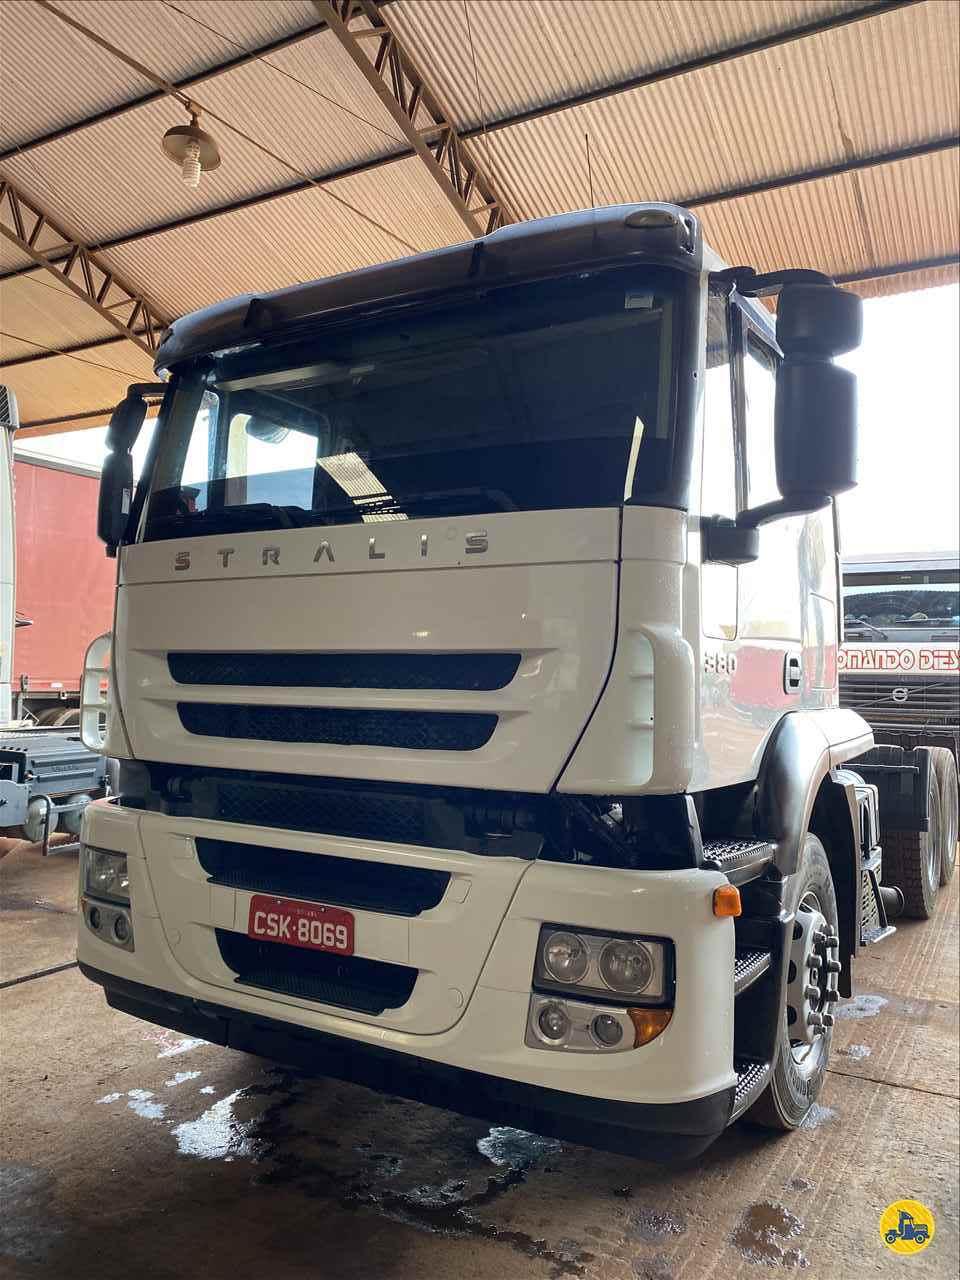 CAMINHAO IVECO STRALIS 380 Cavalo Mecânico Truck 6x2 Troca Frota RONDONOPOLIS MATO GROSSO MT